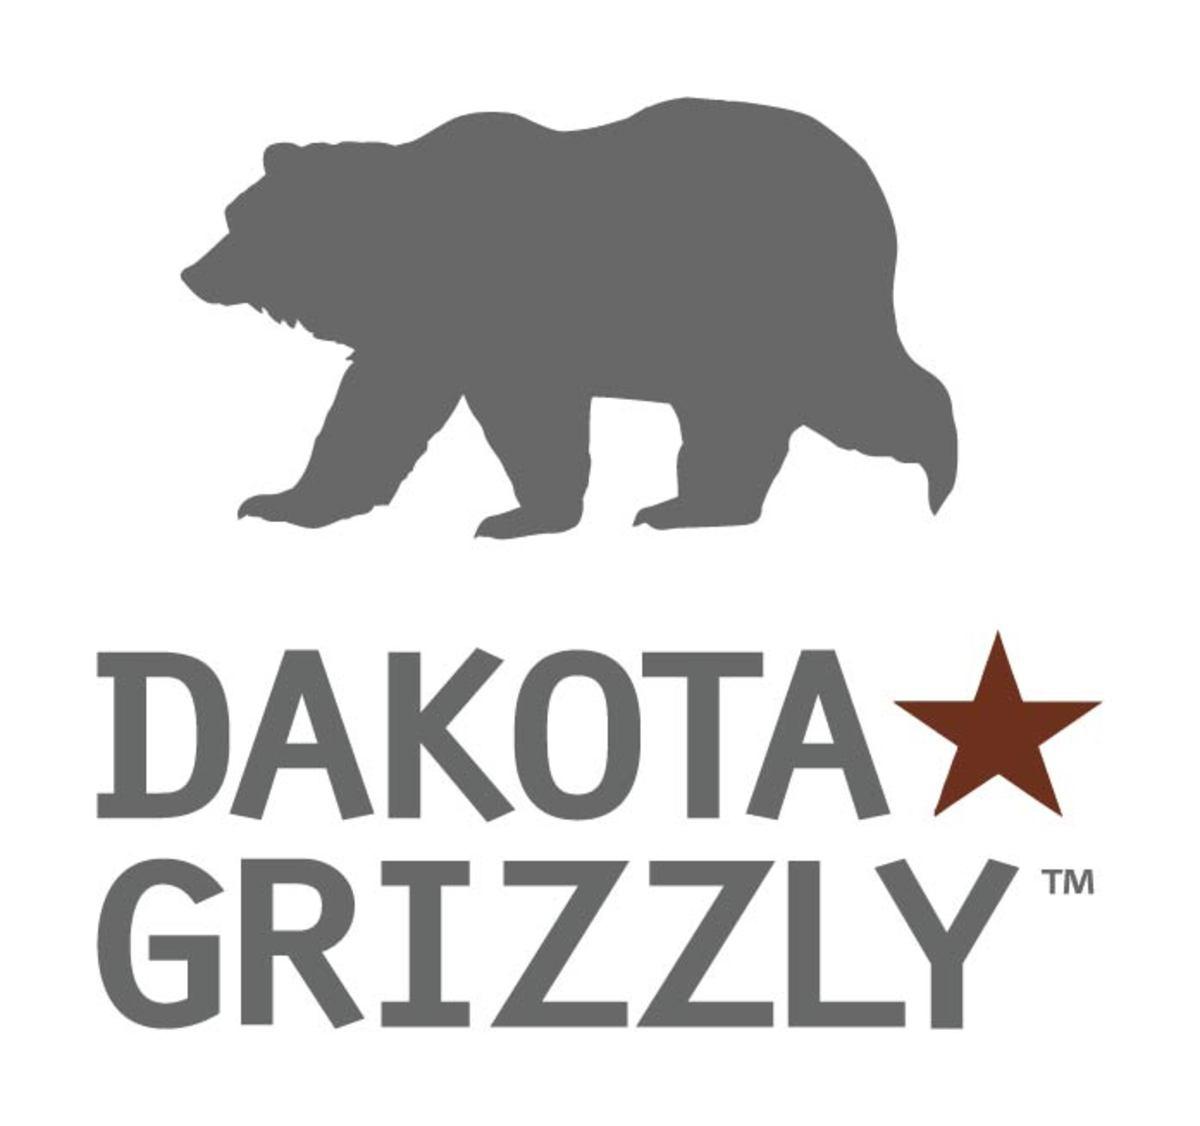 Dakota Grizzley Logo.jpg